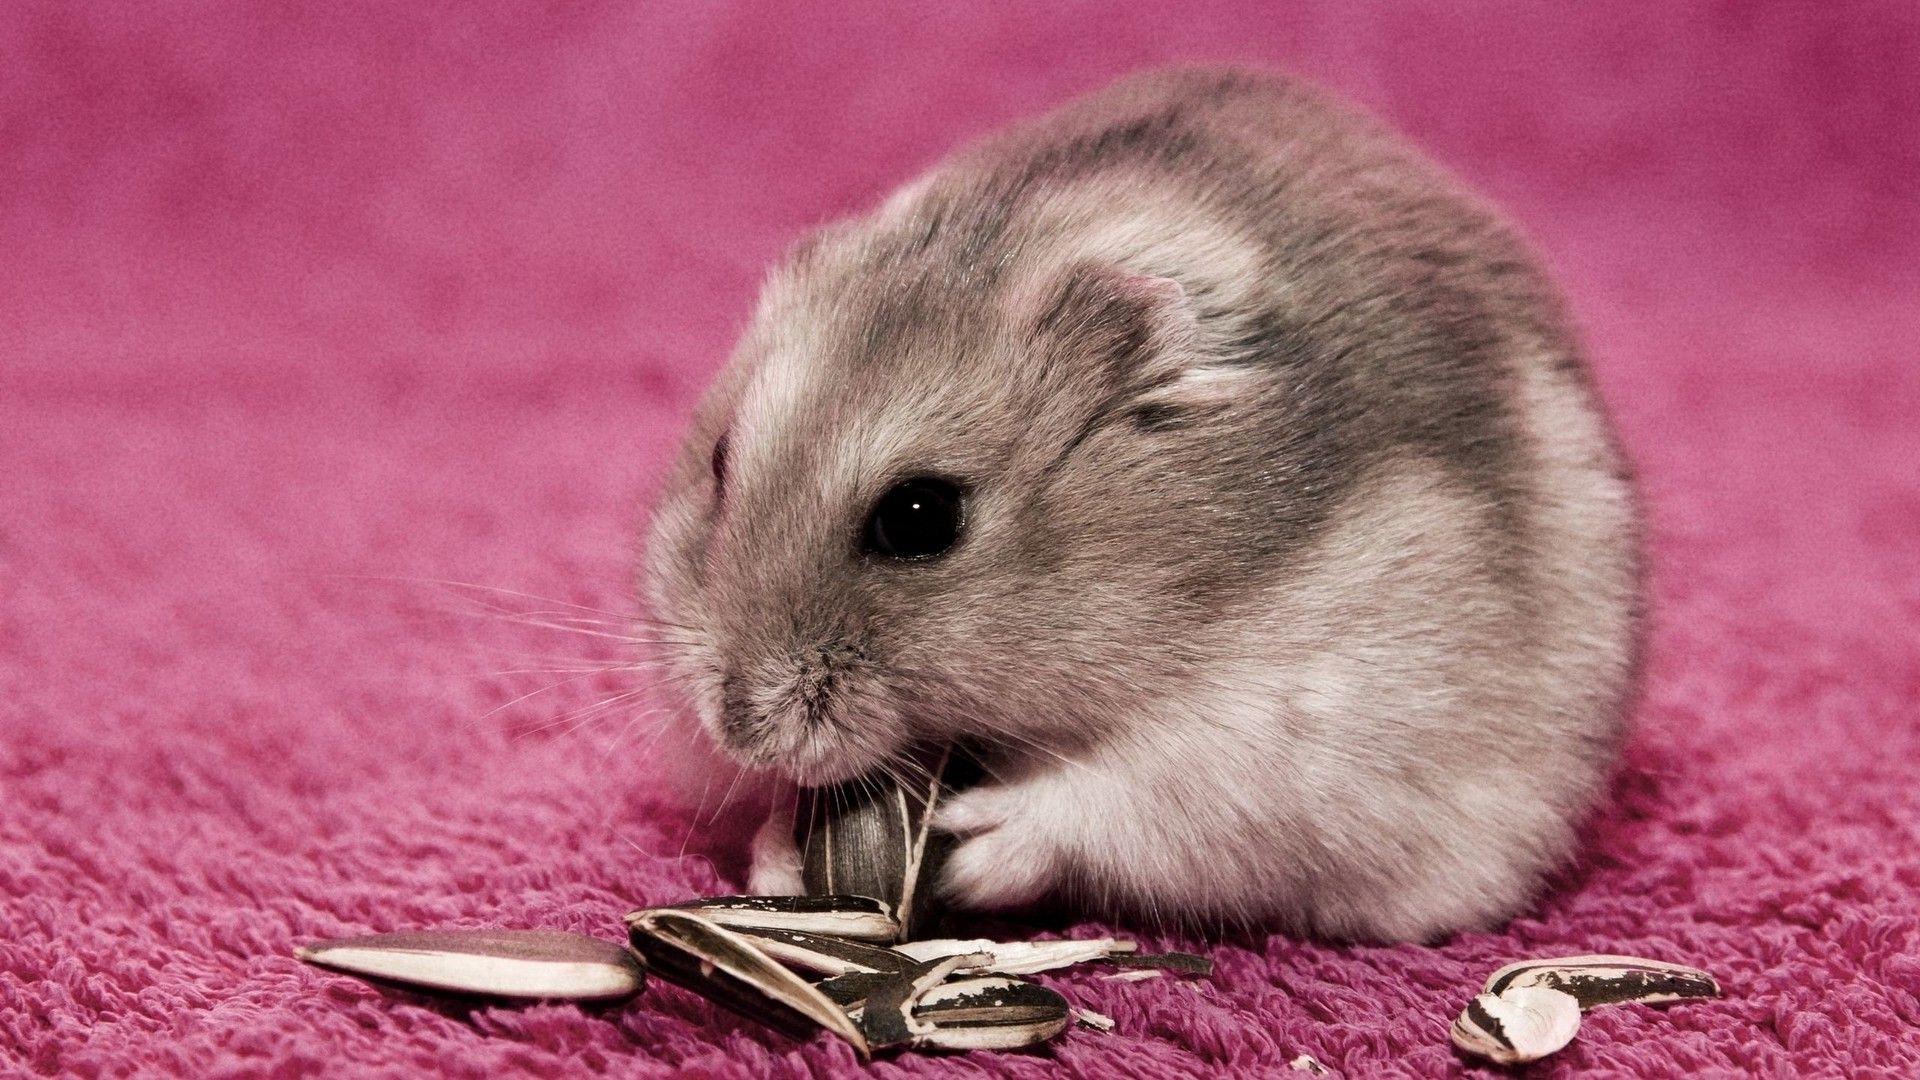 Hamster on a pink carpet wallpaper 15948 1920x1080